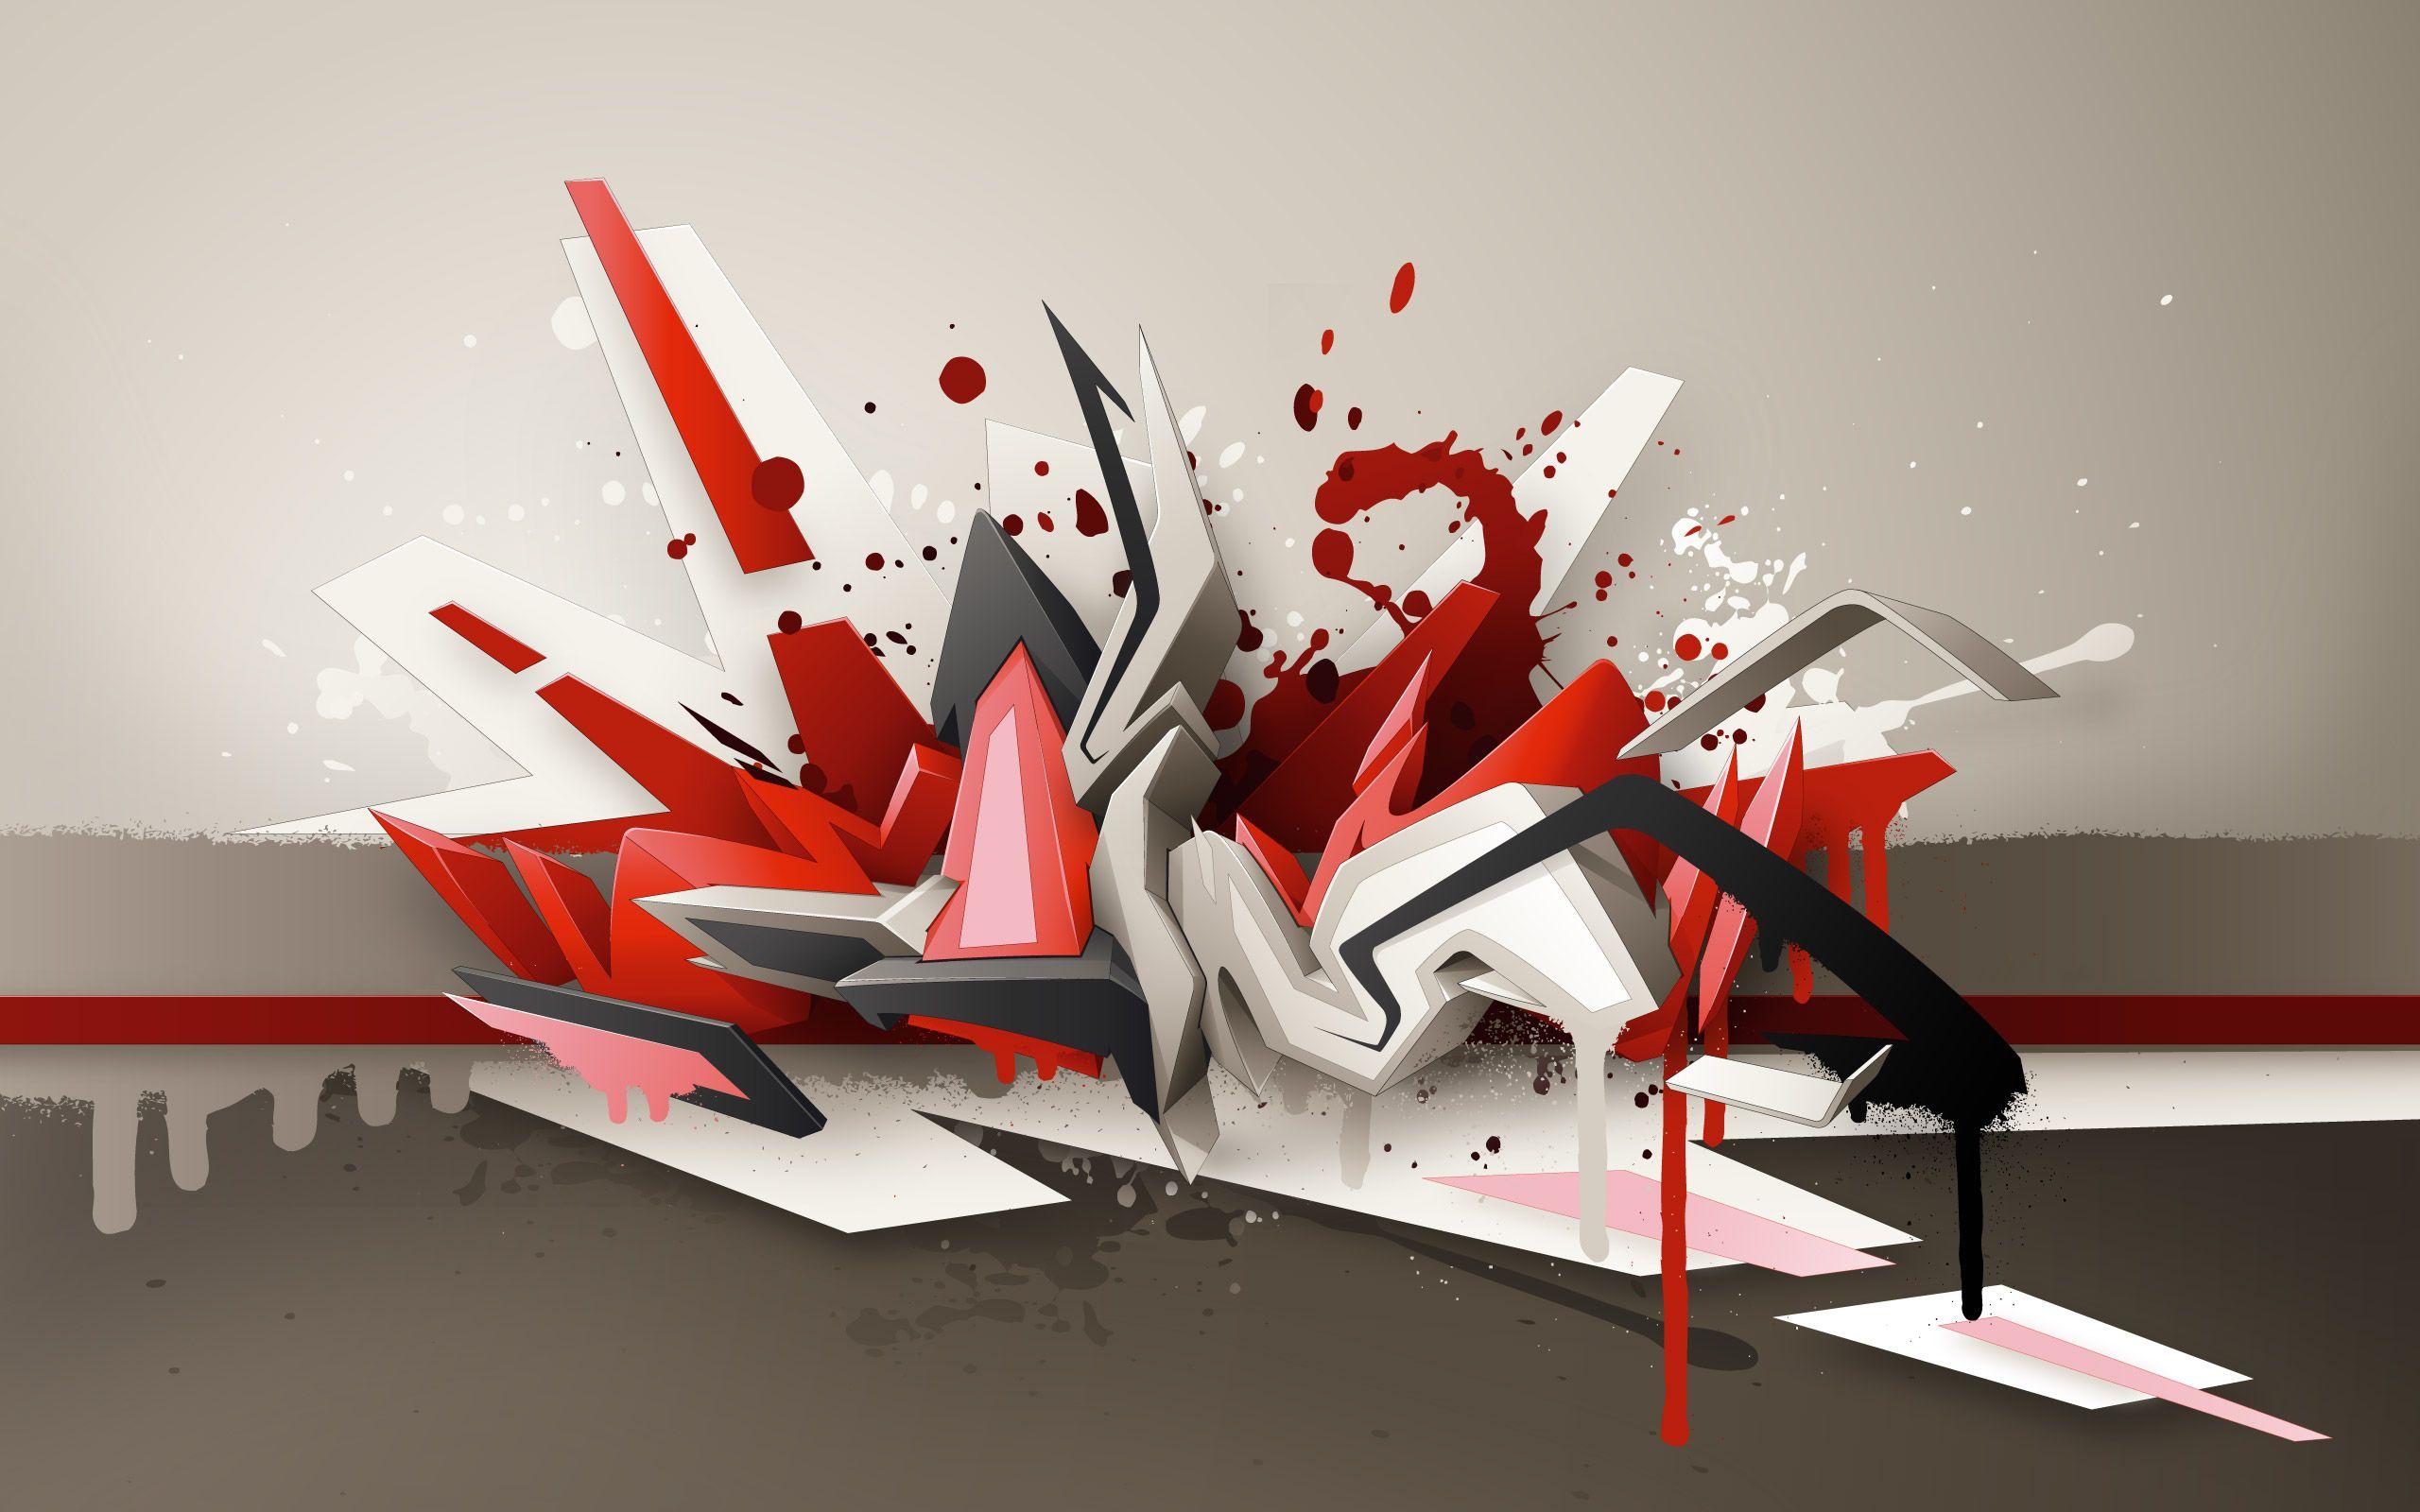 daim graffiti - Google Search | Graffiti Delta 3D | Pinterest ... for 3d Wall Graphic Design  49jwn